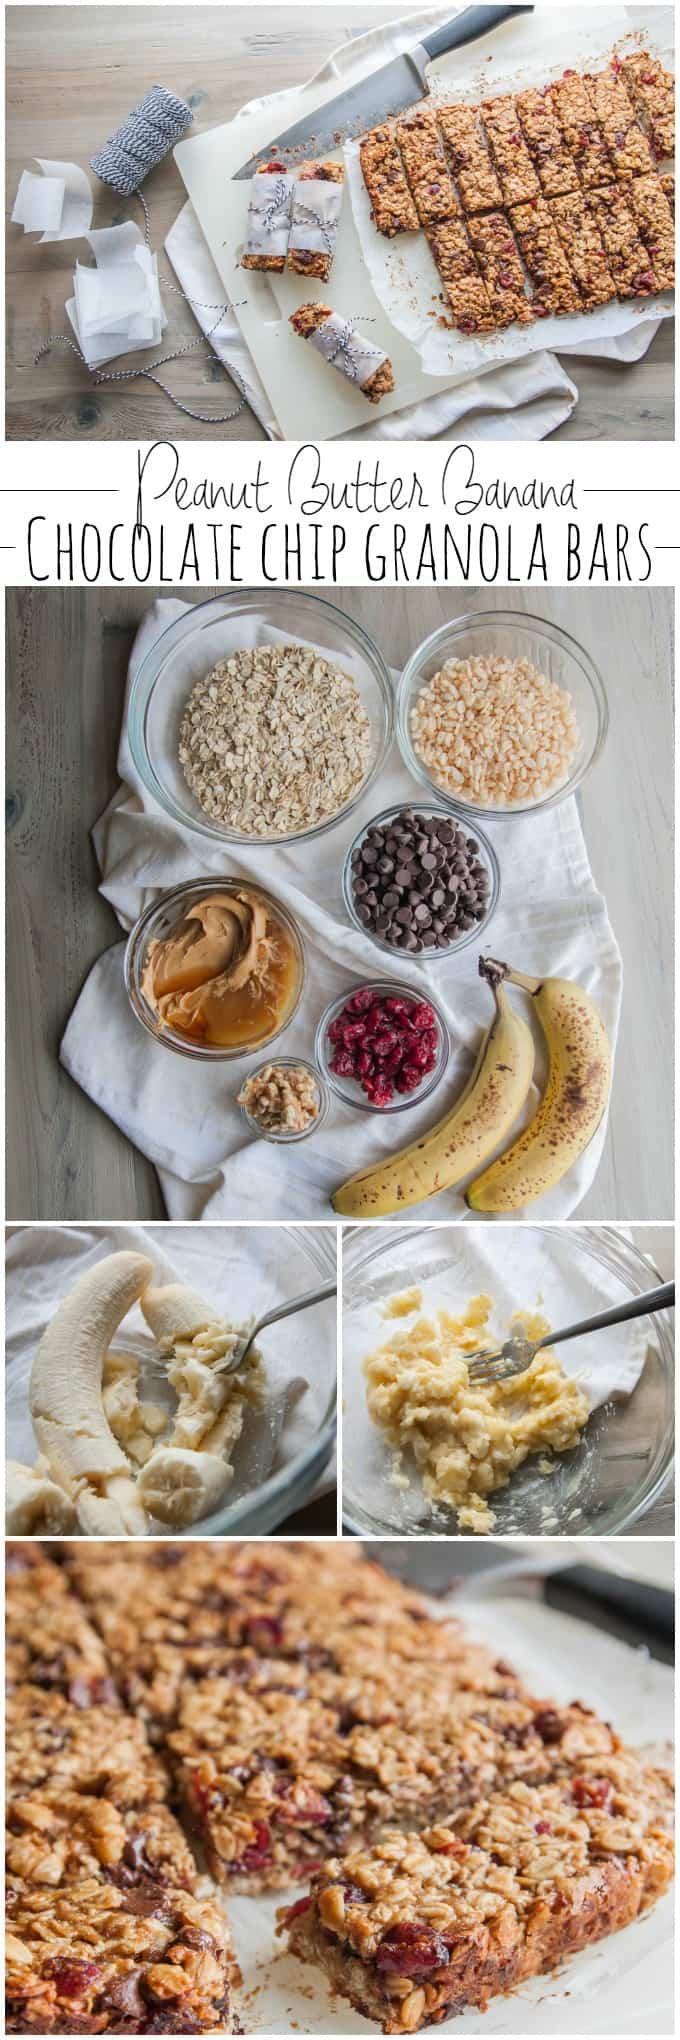 Peanut butter banana chocolate chip granola bars from @sweetphi